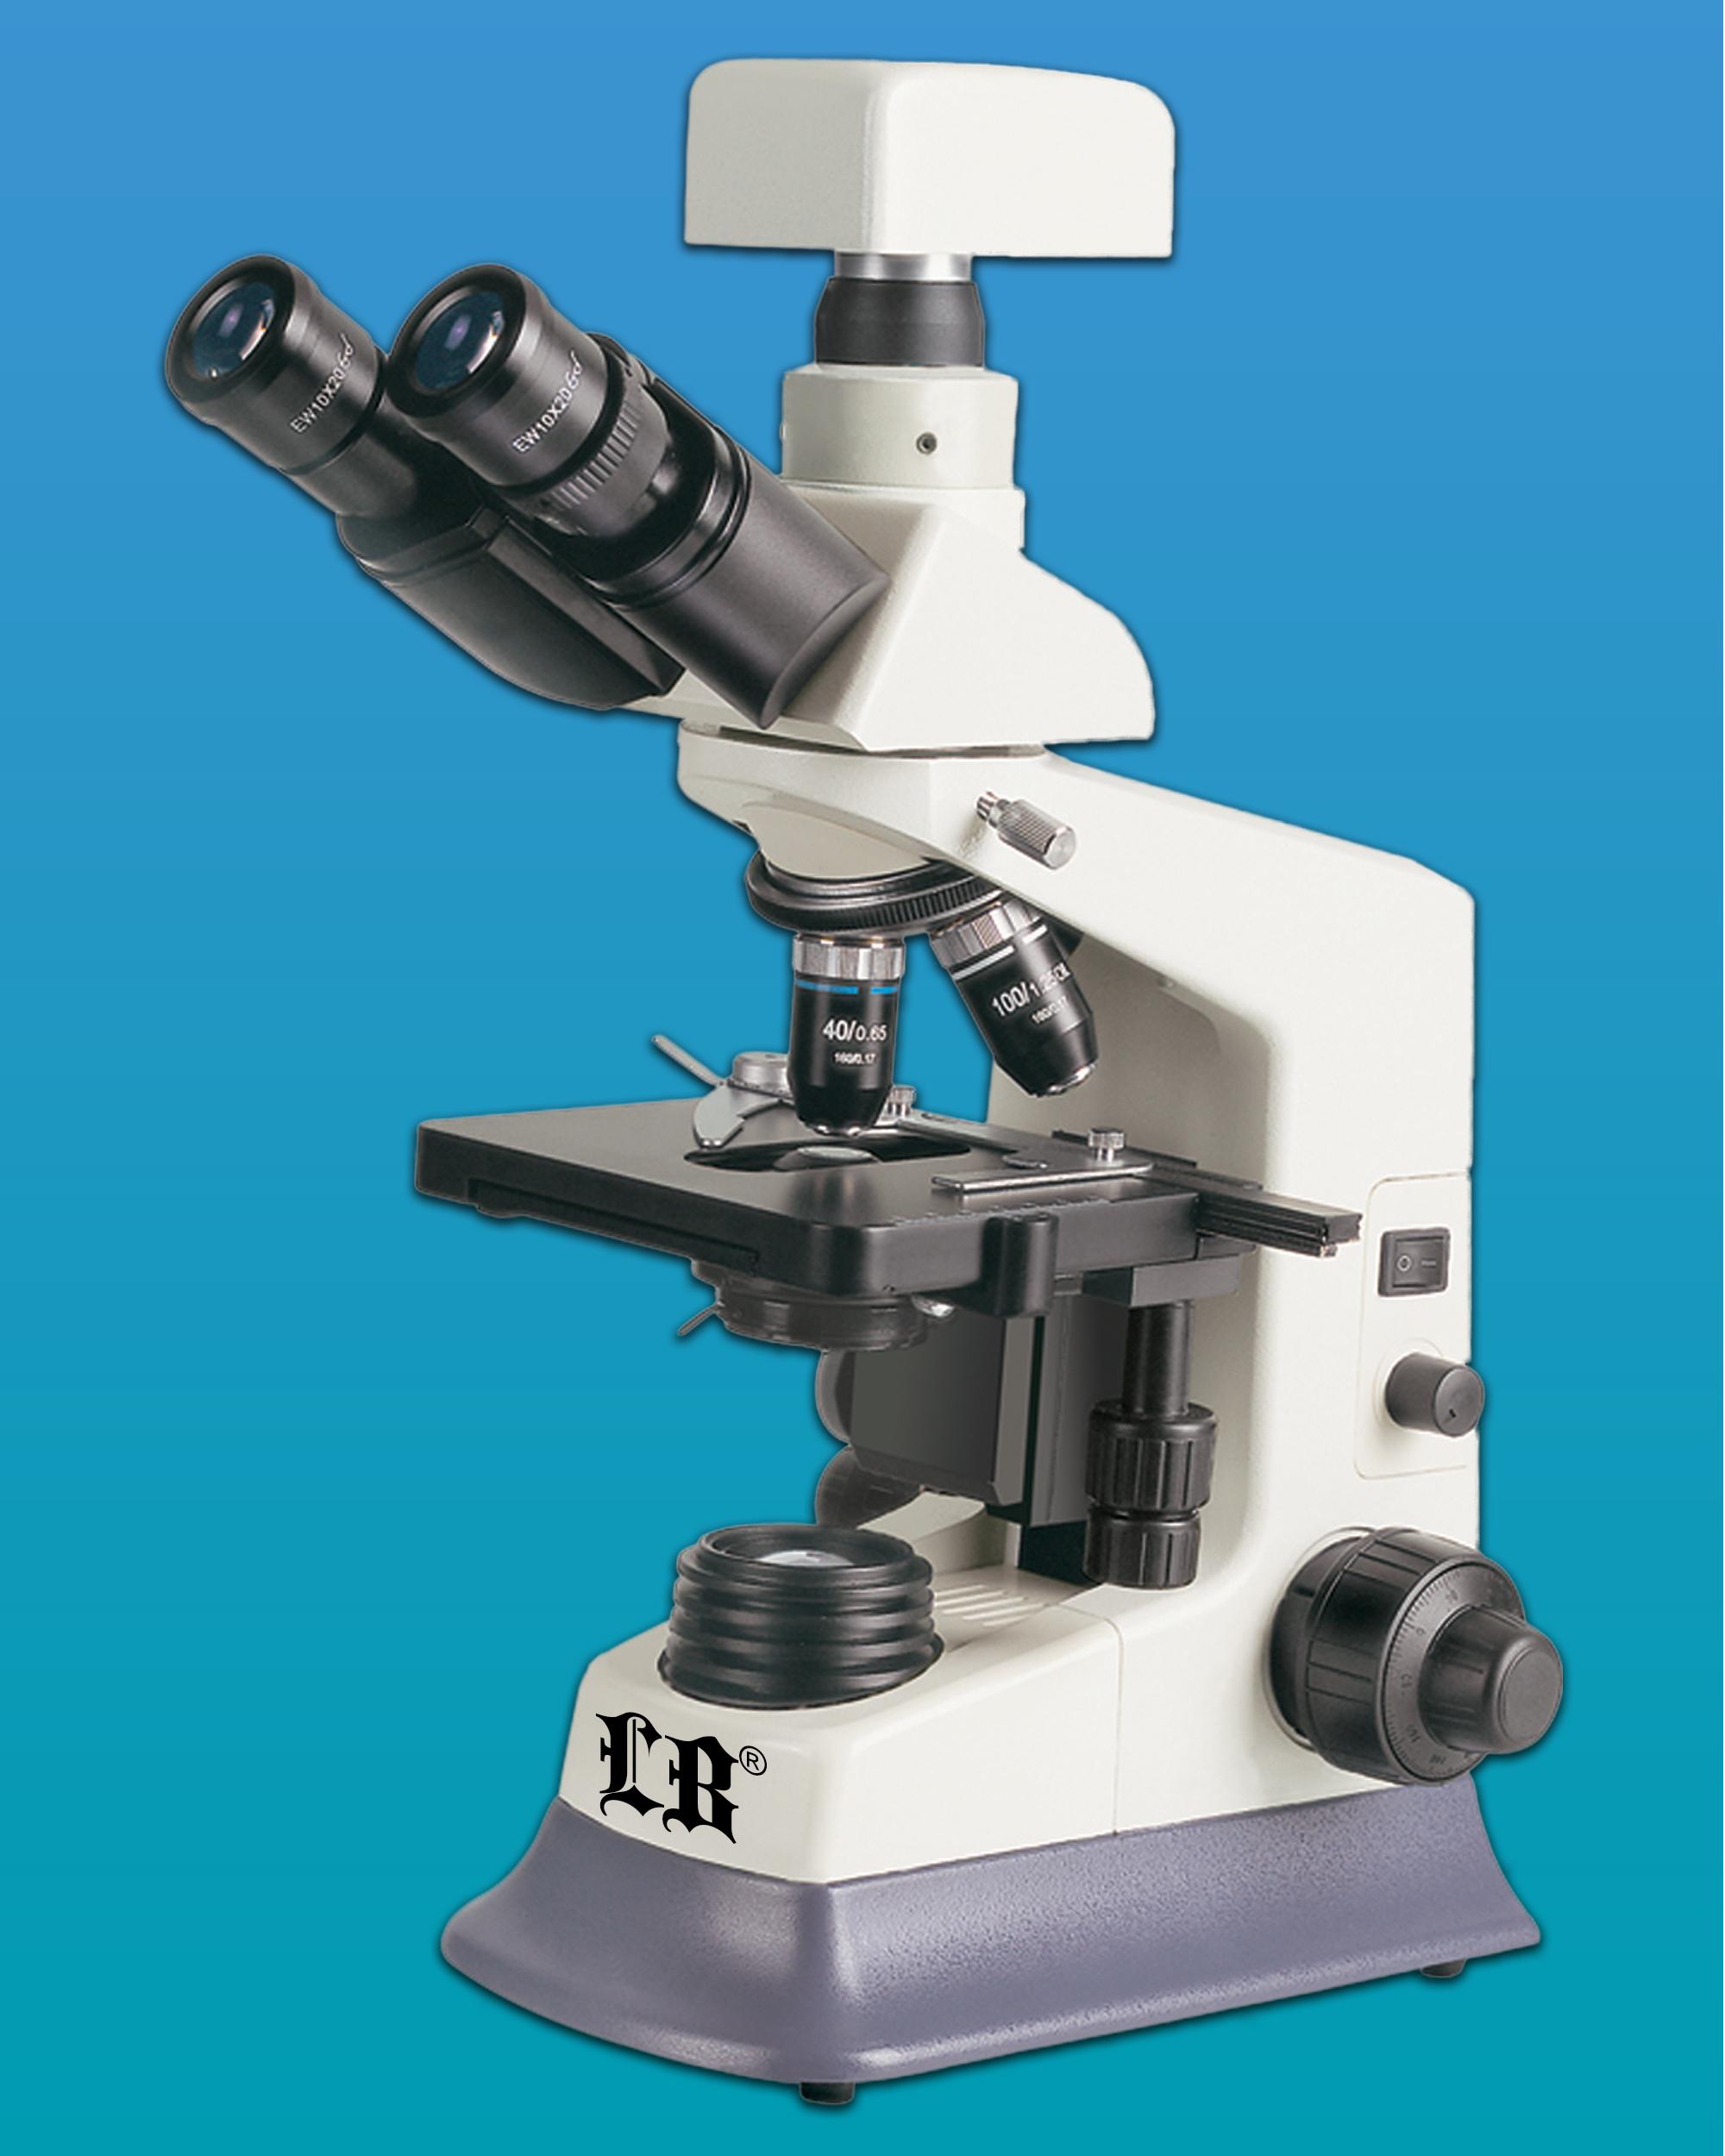 [LB-237] Binocular Bio Digital Microscope w/ Turret Phase Contrast Kit & LED